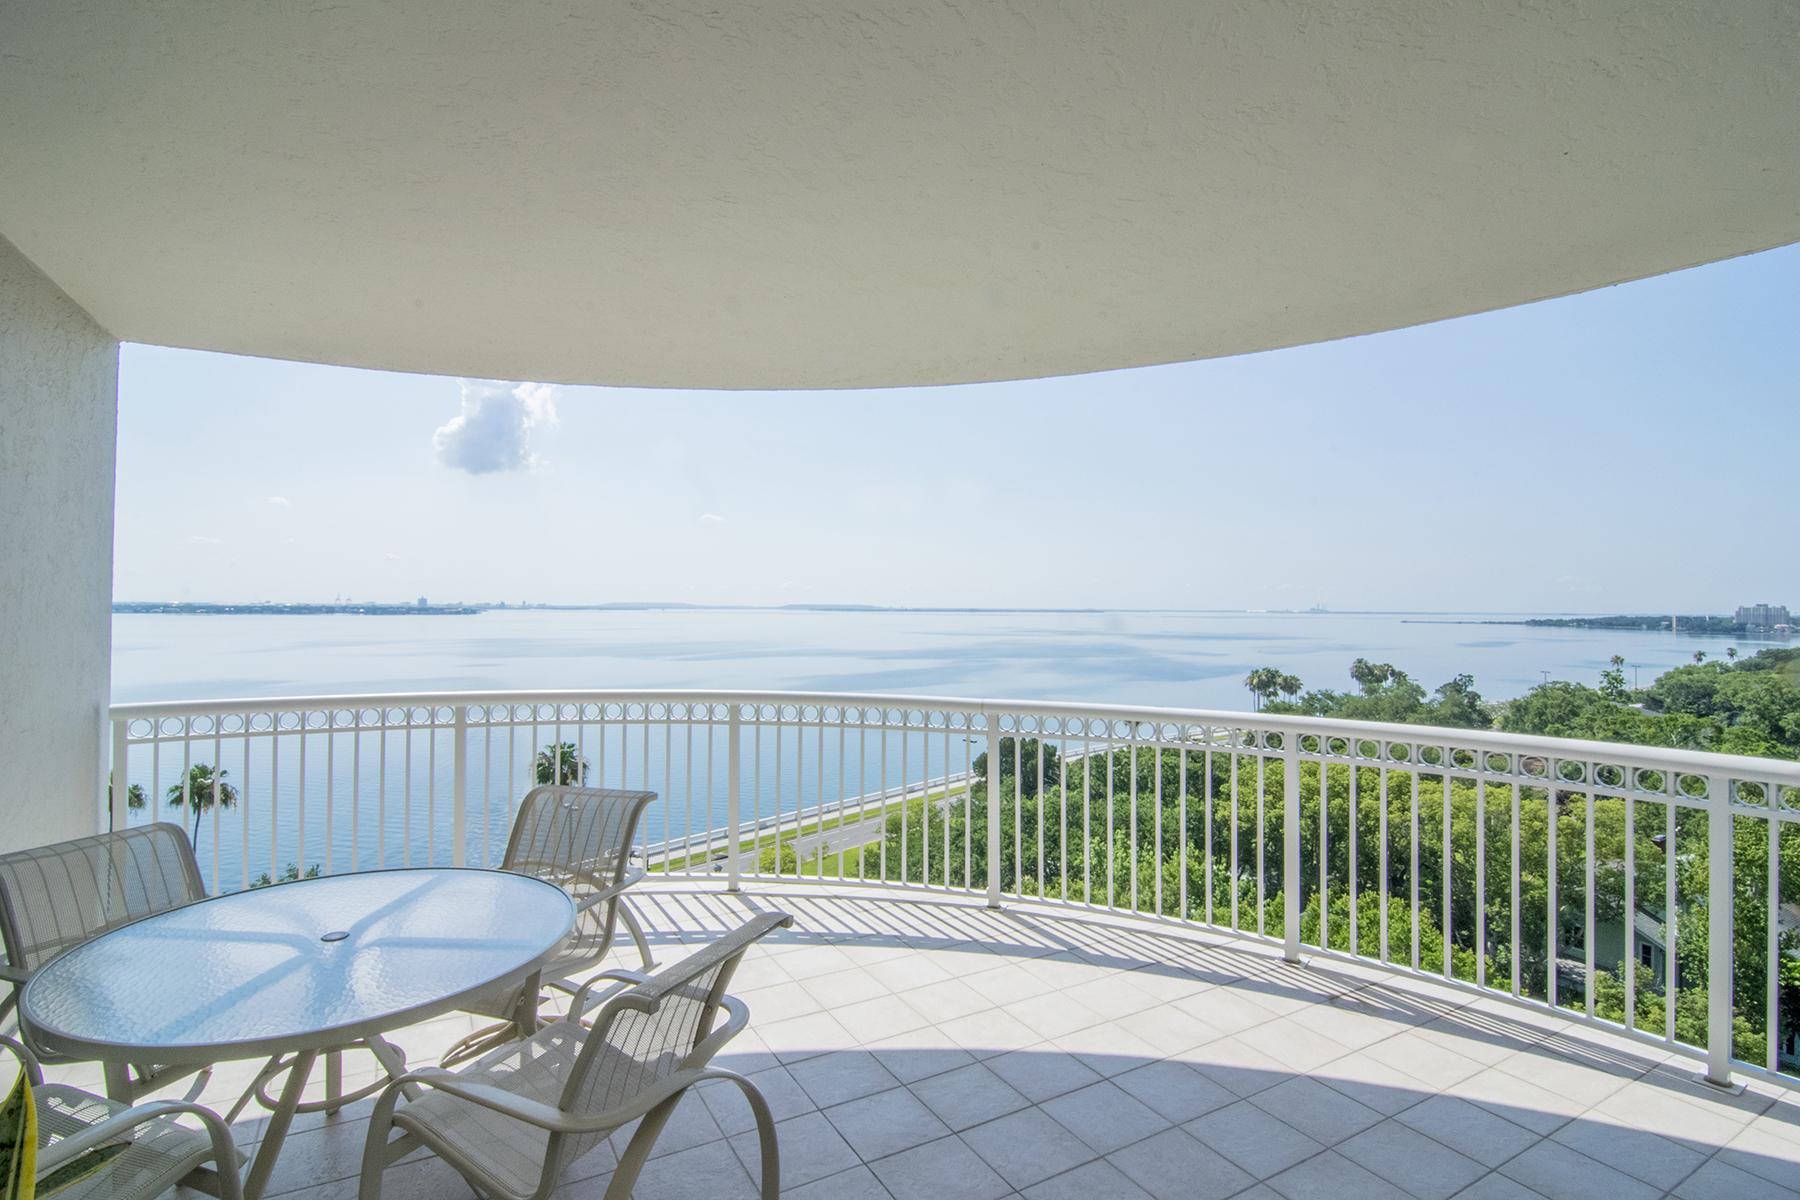 Condominium for Sale at SOUTH TAMPA 3507 Bayshore Blvd 901 Tampa, Florida, 33629 United States